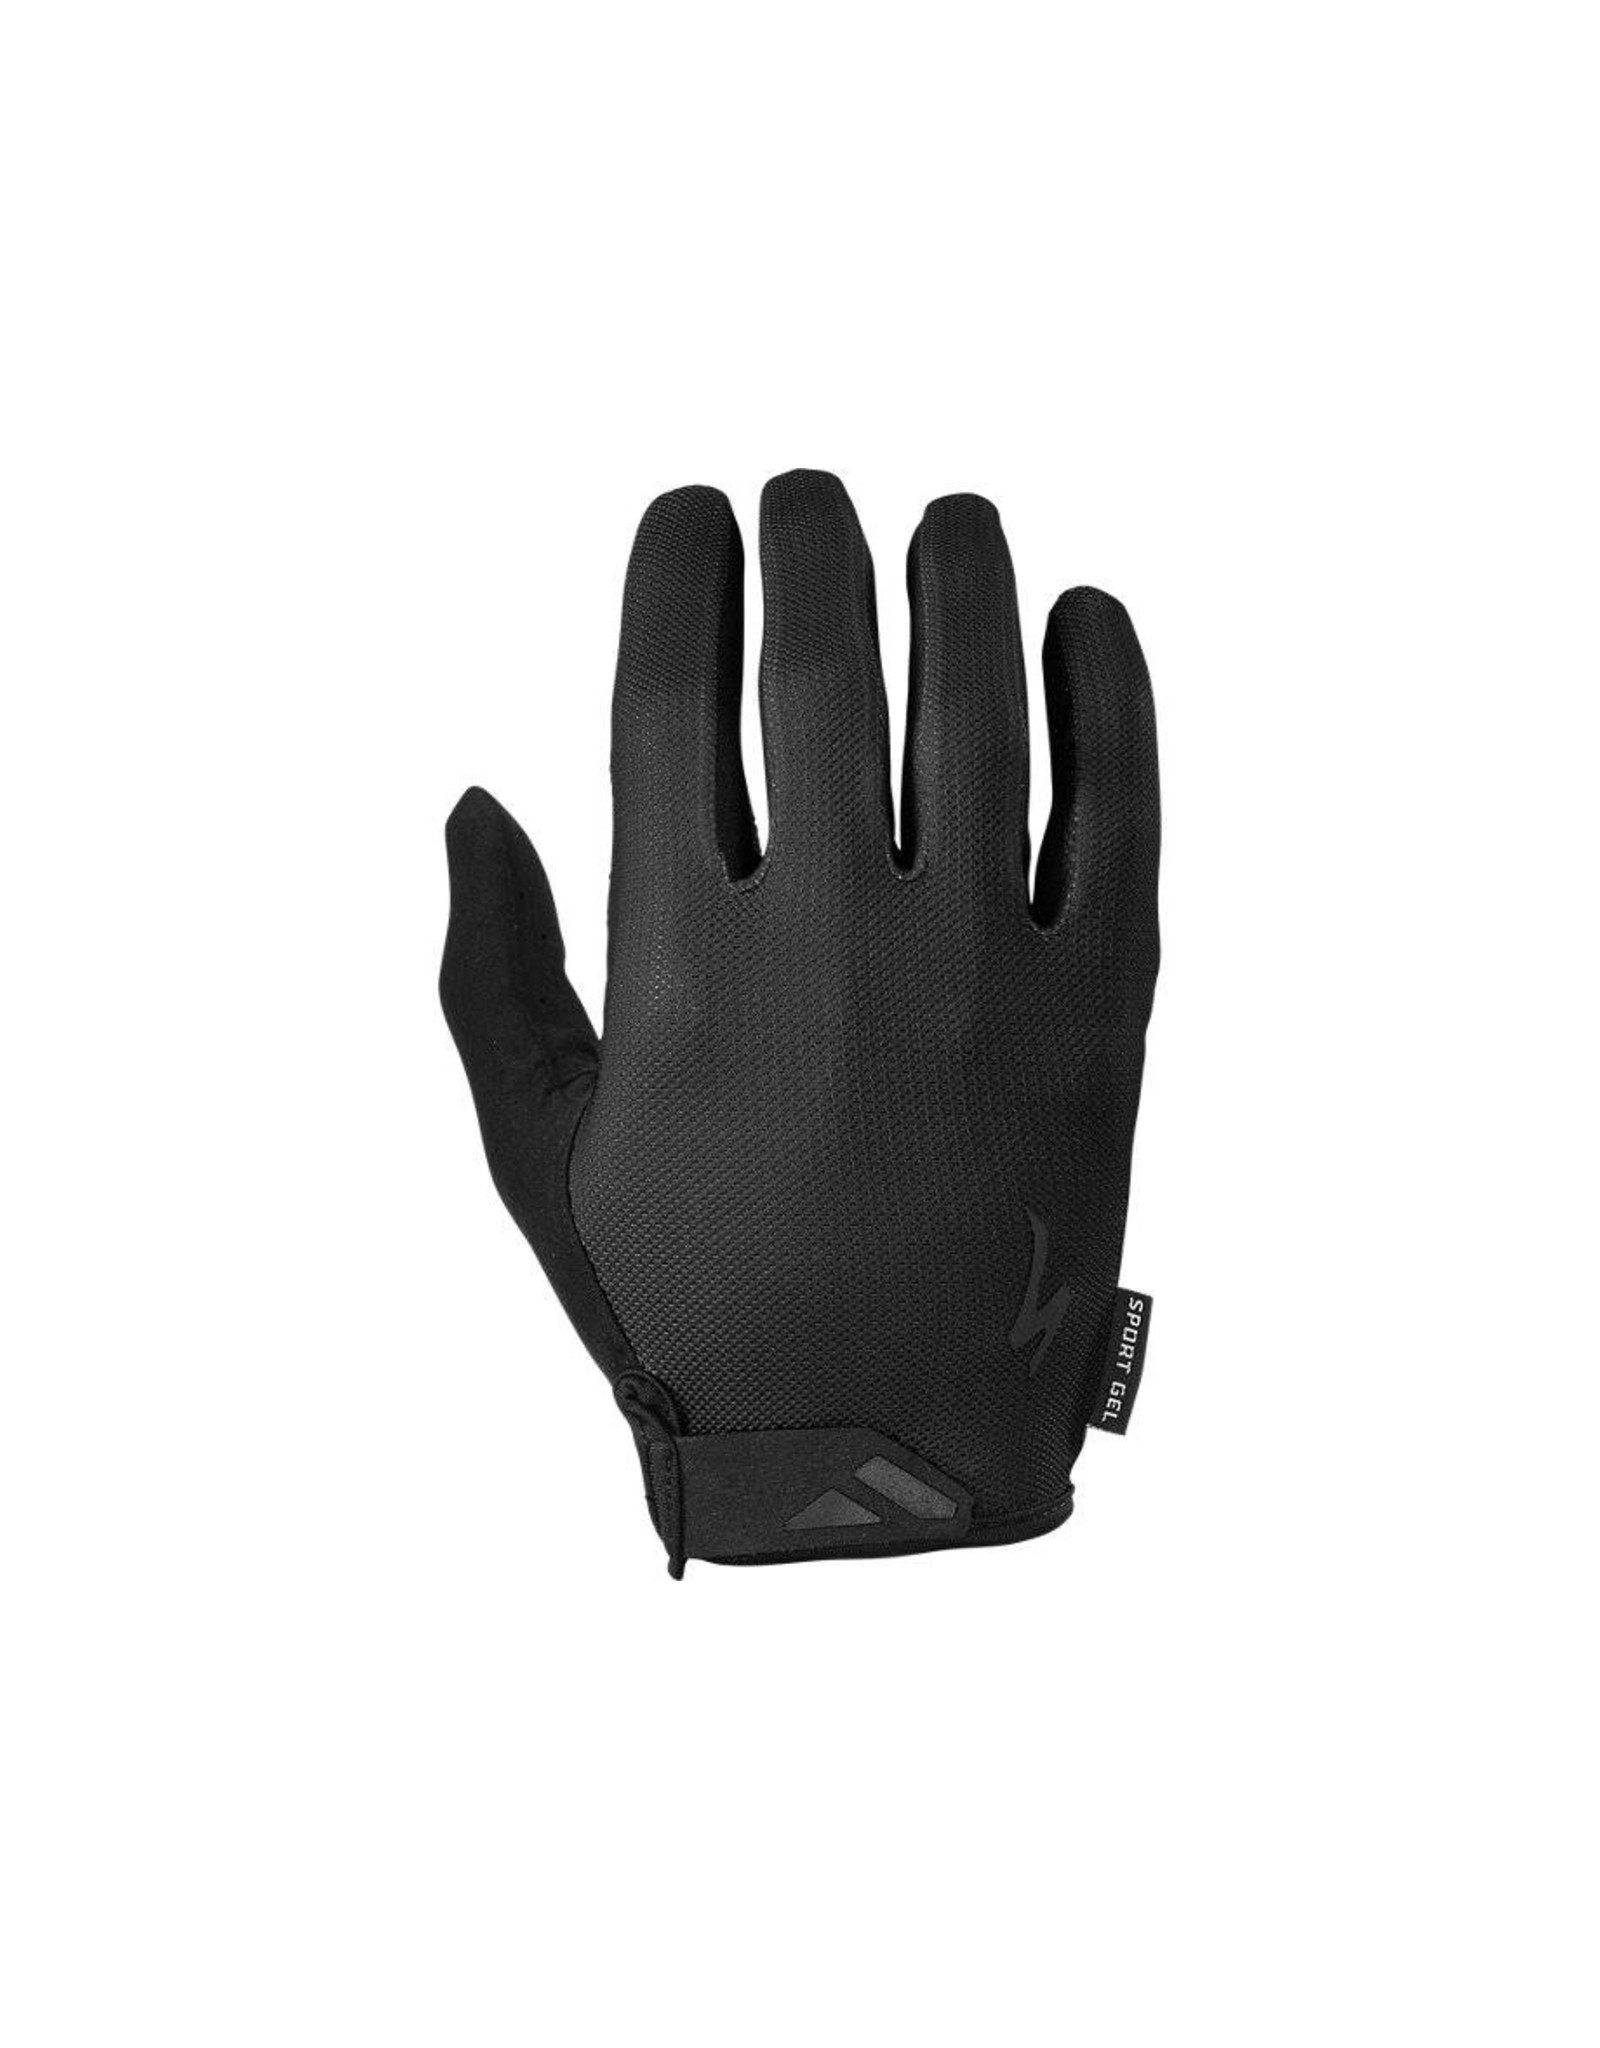 SPECIALIZED Specialized BG Sport Gel Glove Long Finger - Black